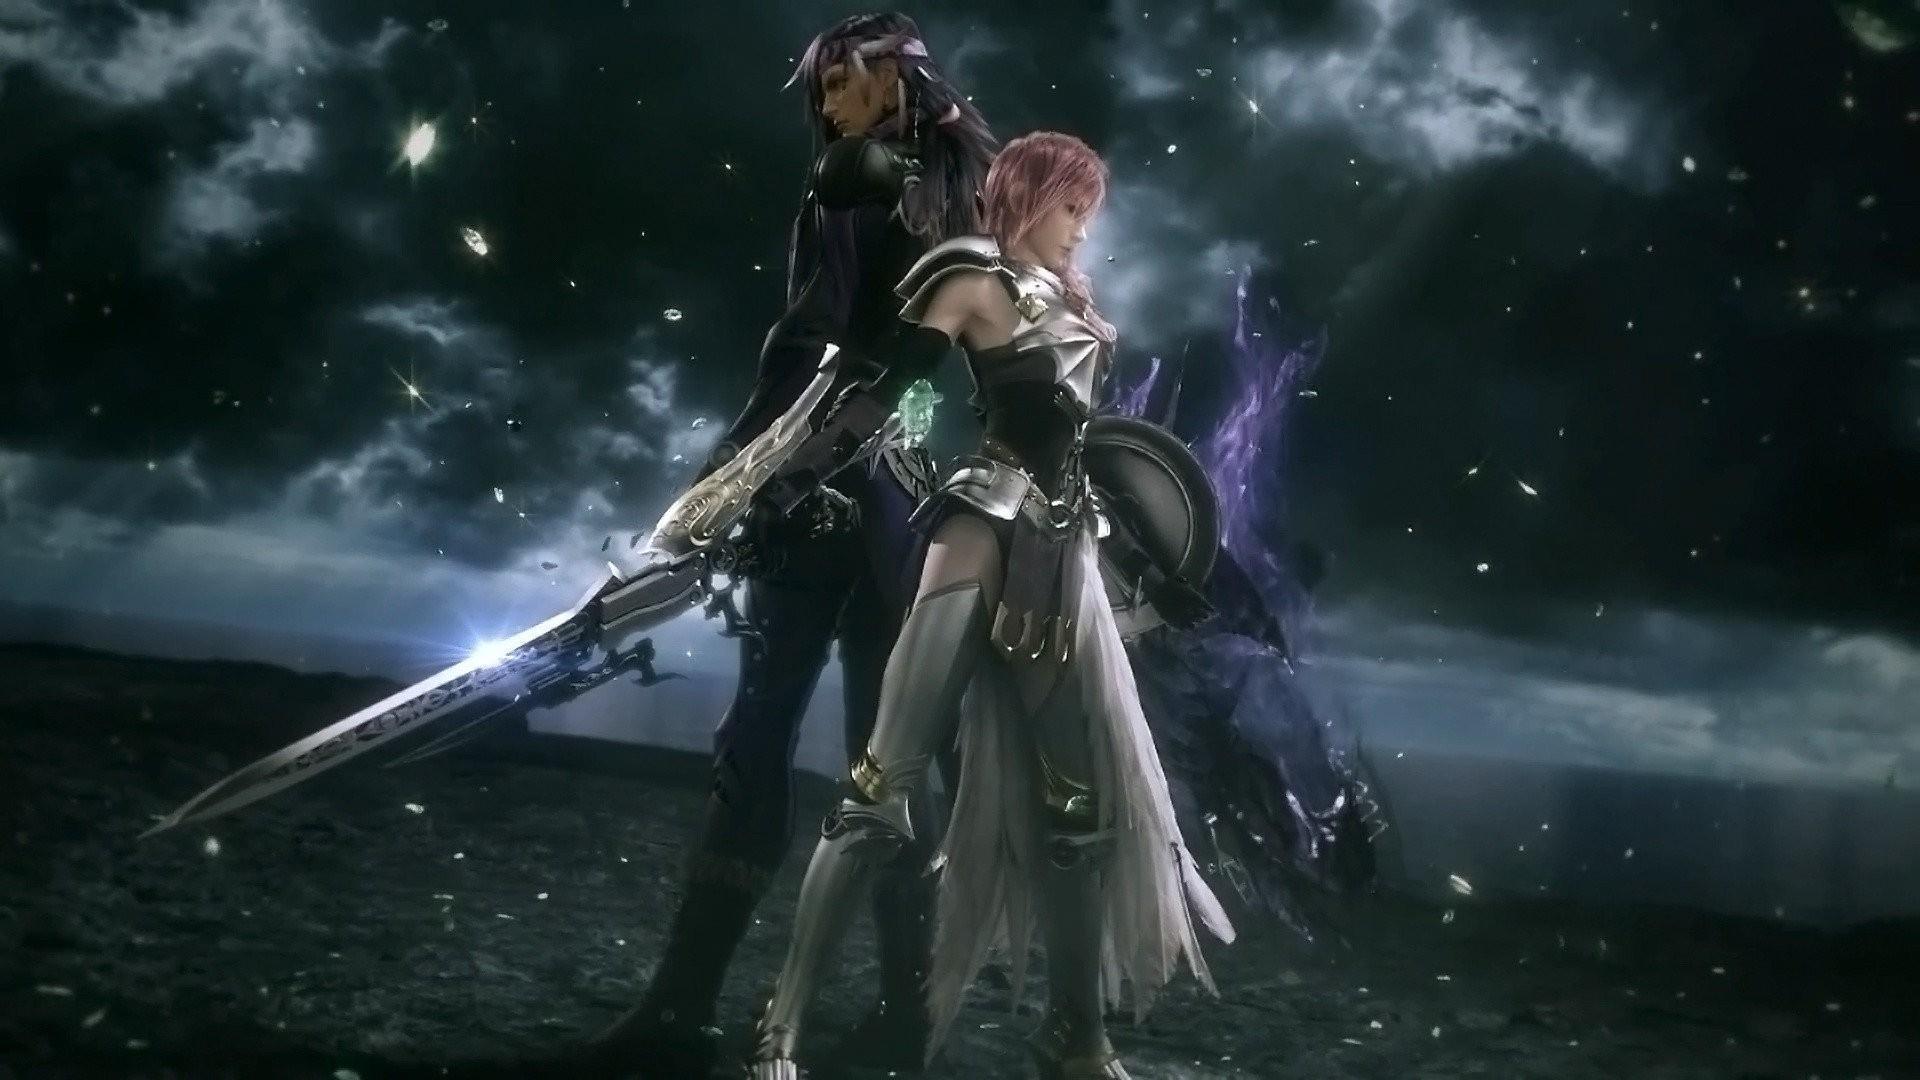 Final Fantasy VII Remake HD Wallpapers - Wallpaper Cave